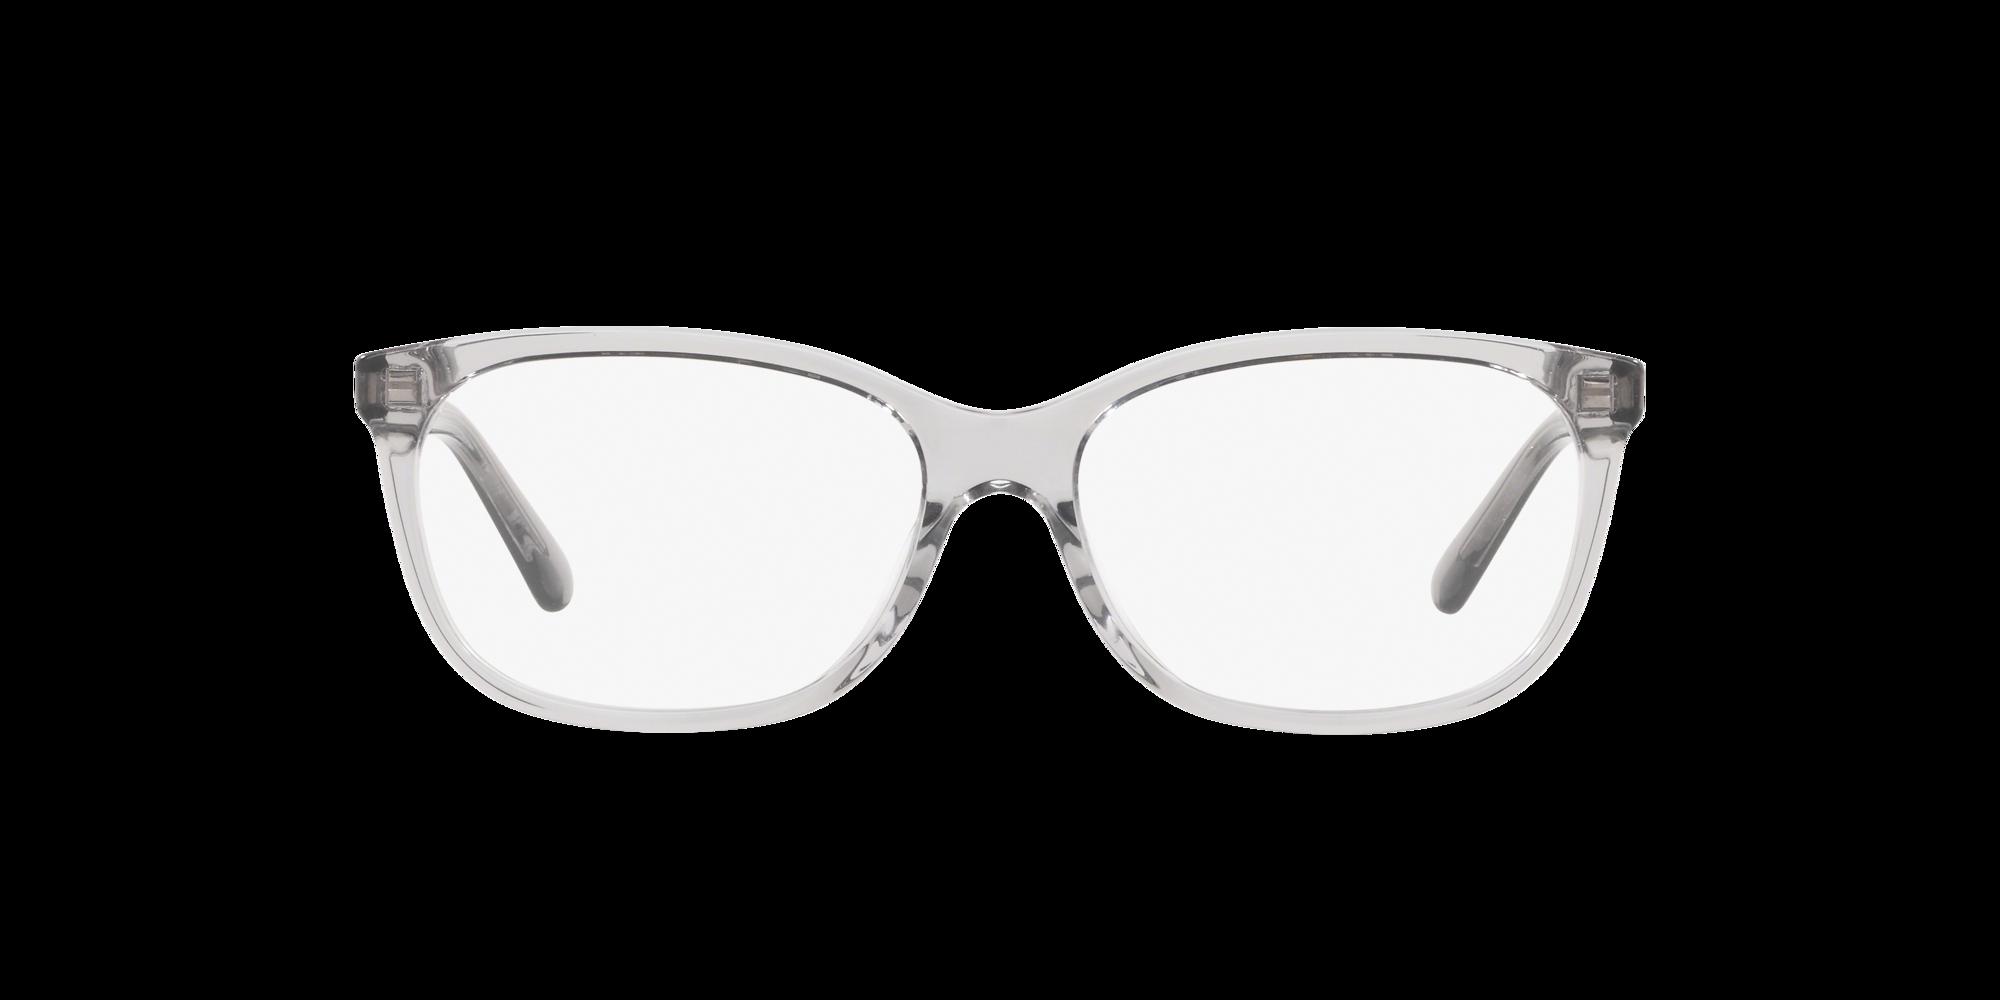 Image for HC6139U from LensCrafters   Glasses, Prescription Glasses Online, Eyewear